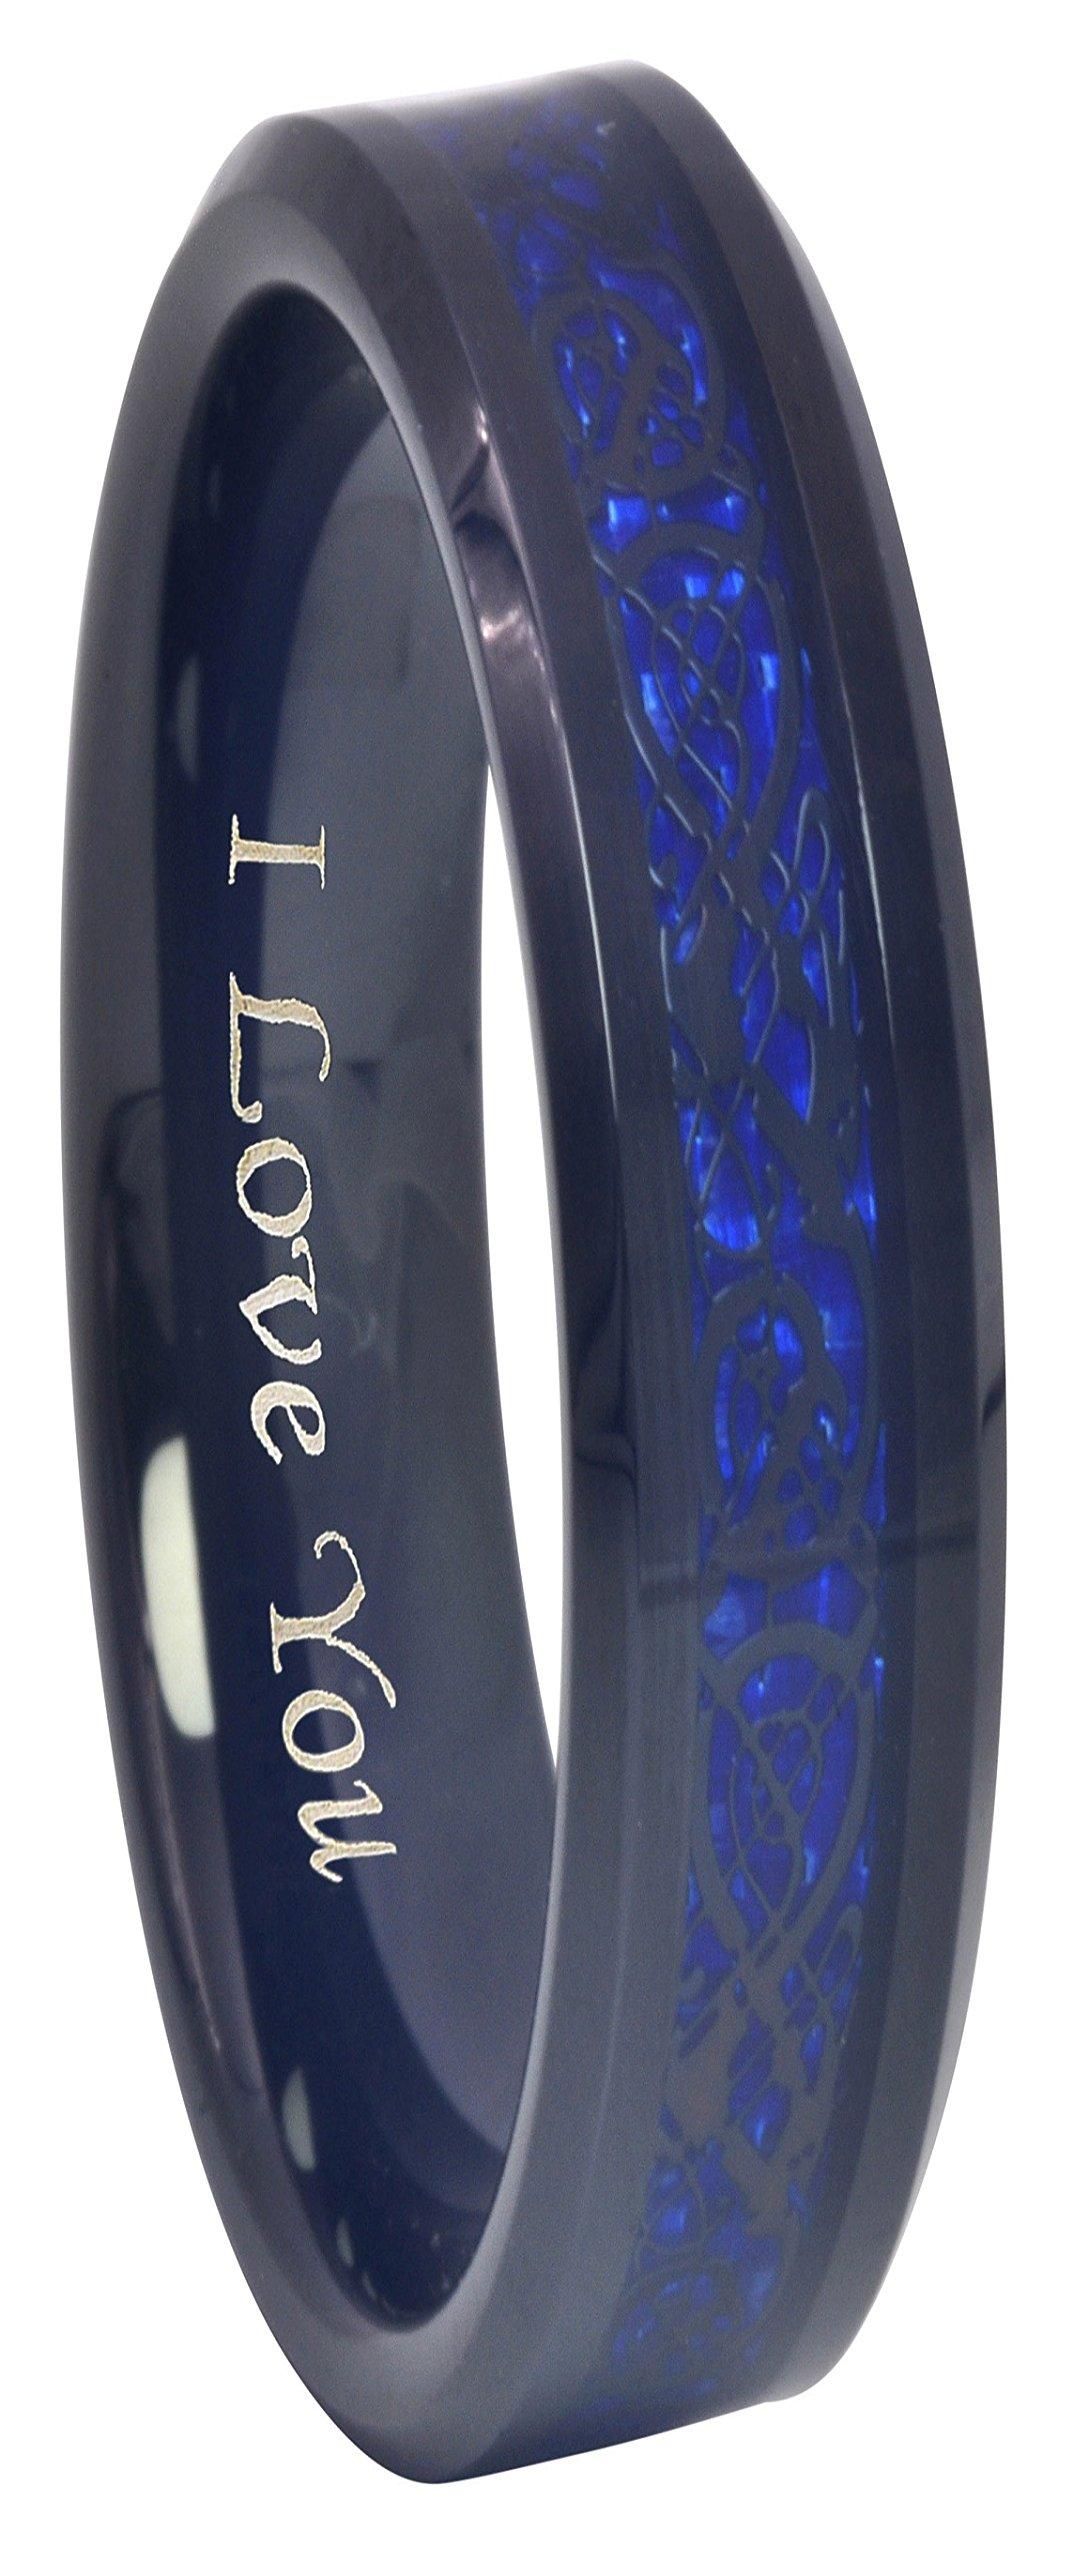 Crownal 6mm 8mm Blue/Green Carbon Fiber Black Celtic Dragon Tungsten Carbide Wedding Band Ring Engraved ''I Love You'' (6mm,8.5)